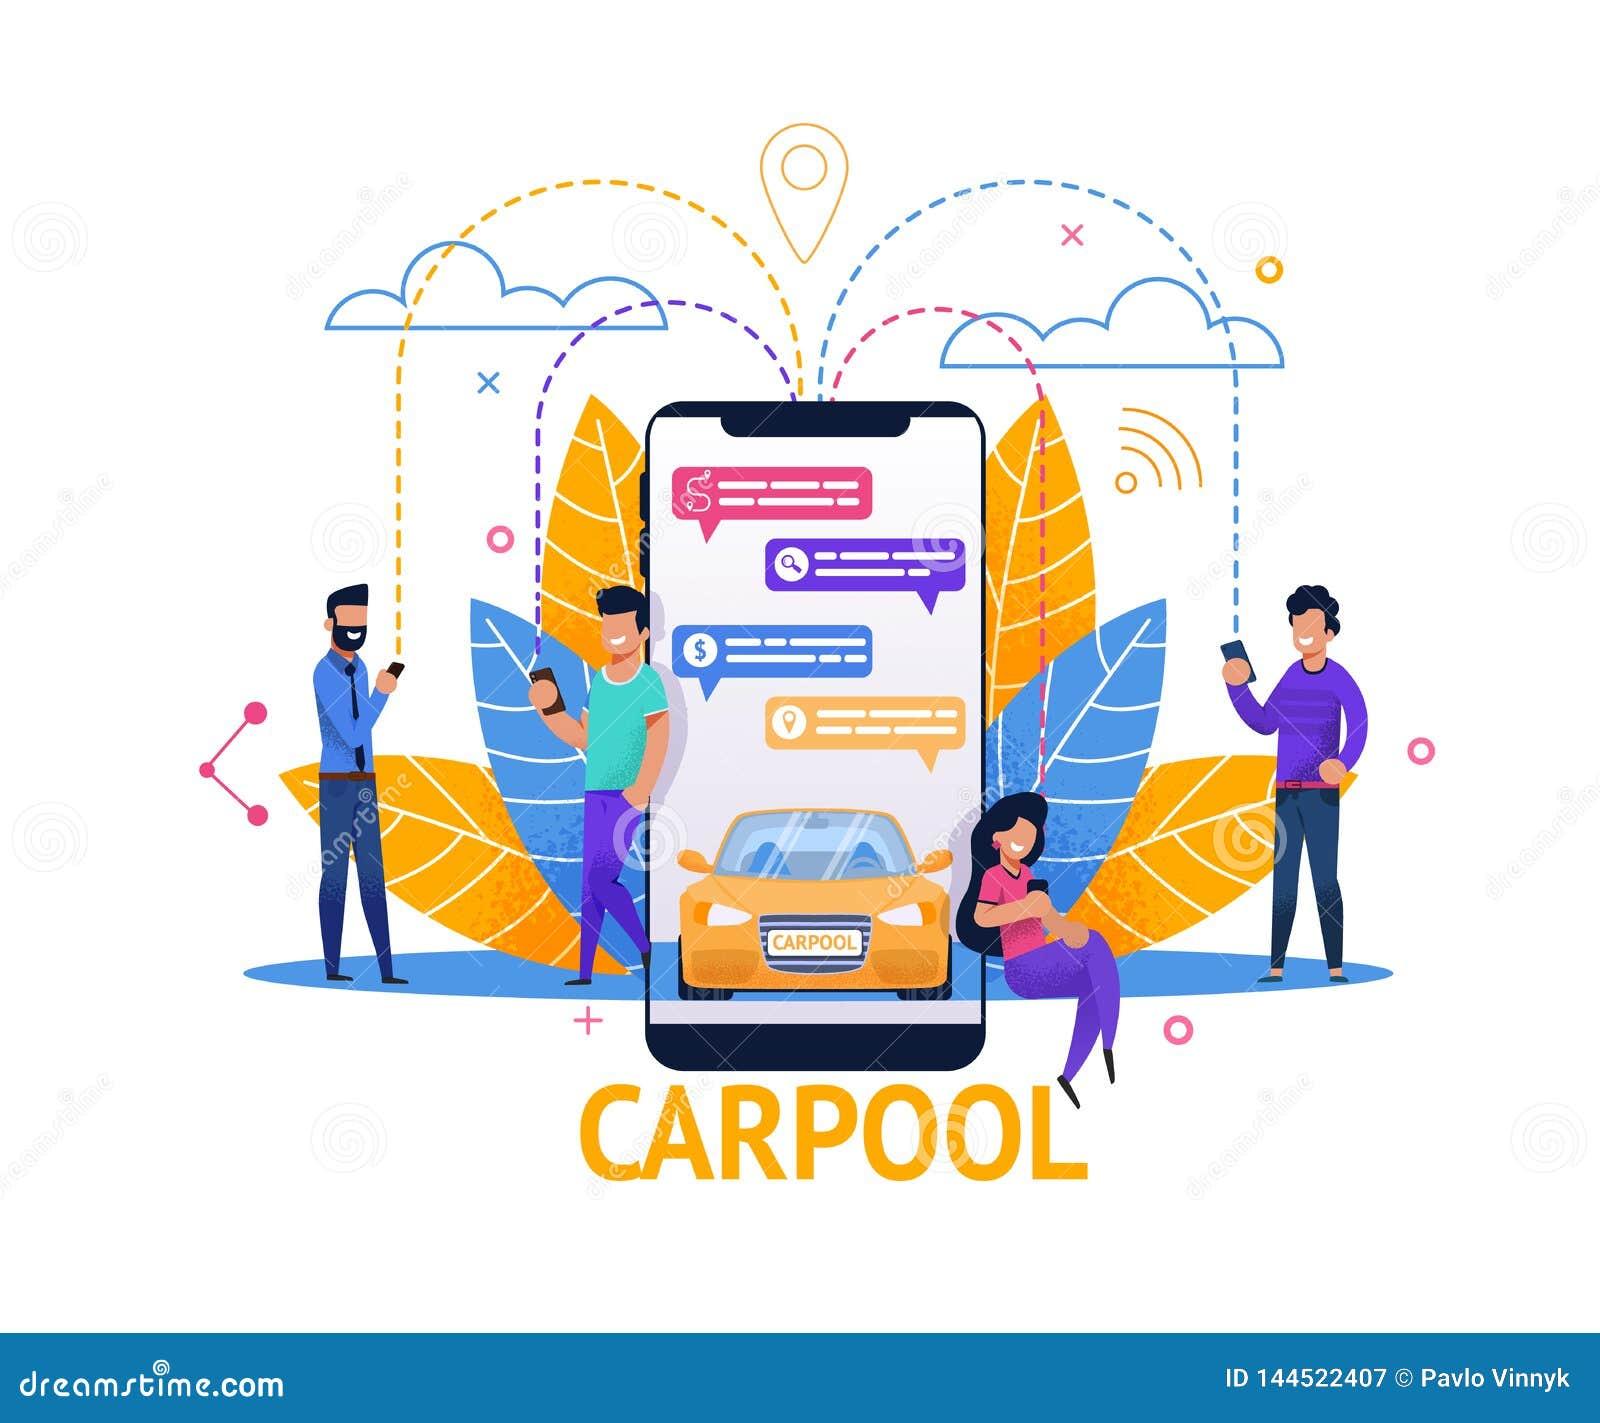 Carpool Mobiele Toepassing Rit Planning in Praatje